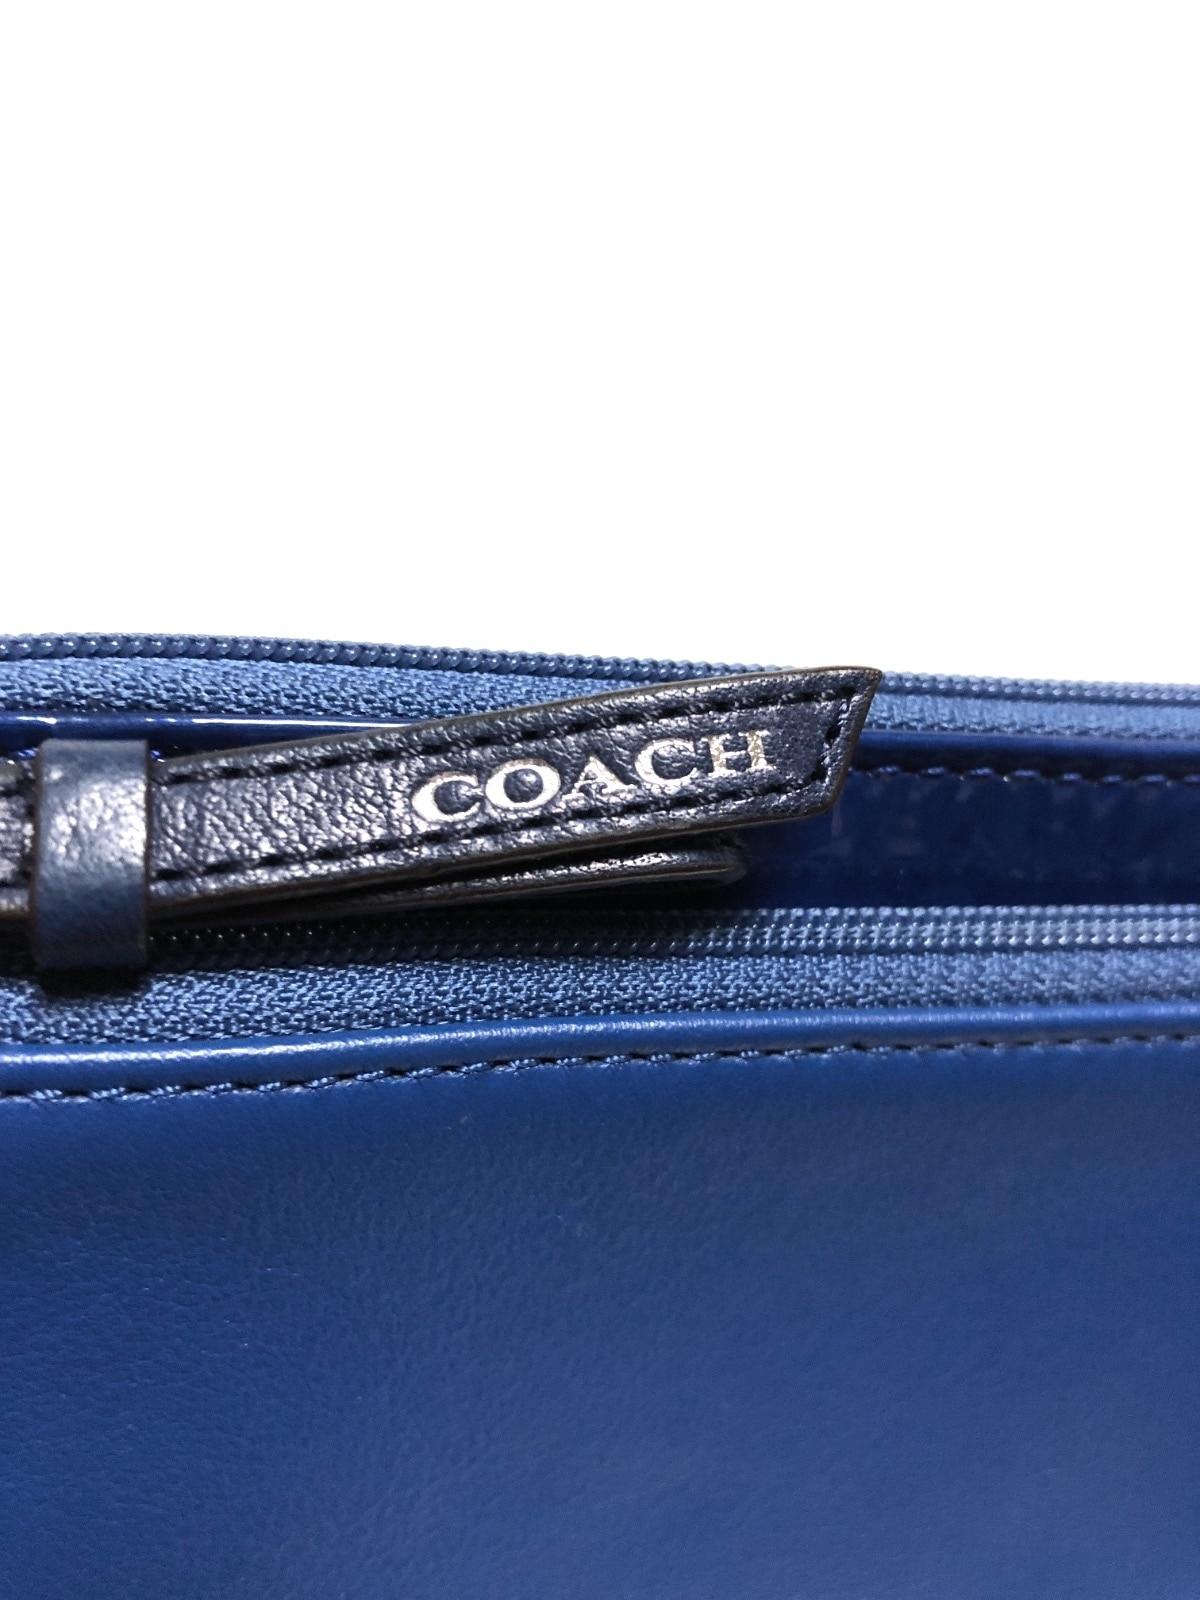 8bb6da28942d COACH(コーチ) 財布美品 - ダークネイビー ストラップ付き(12542941 ...